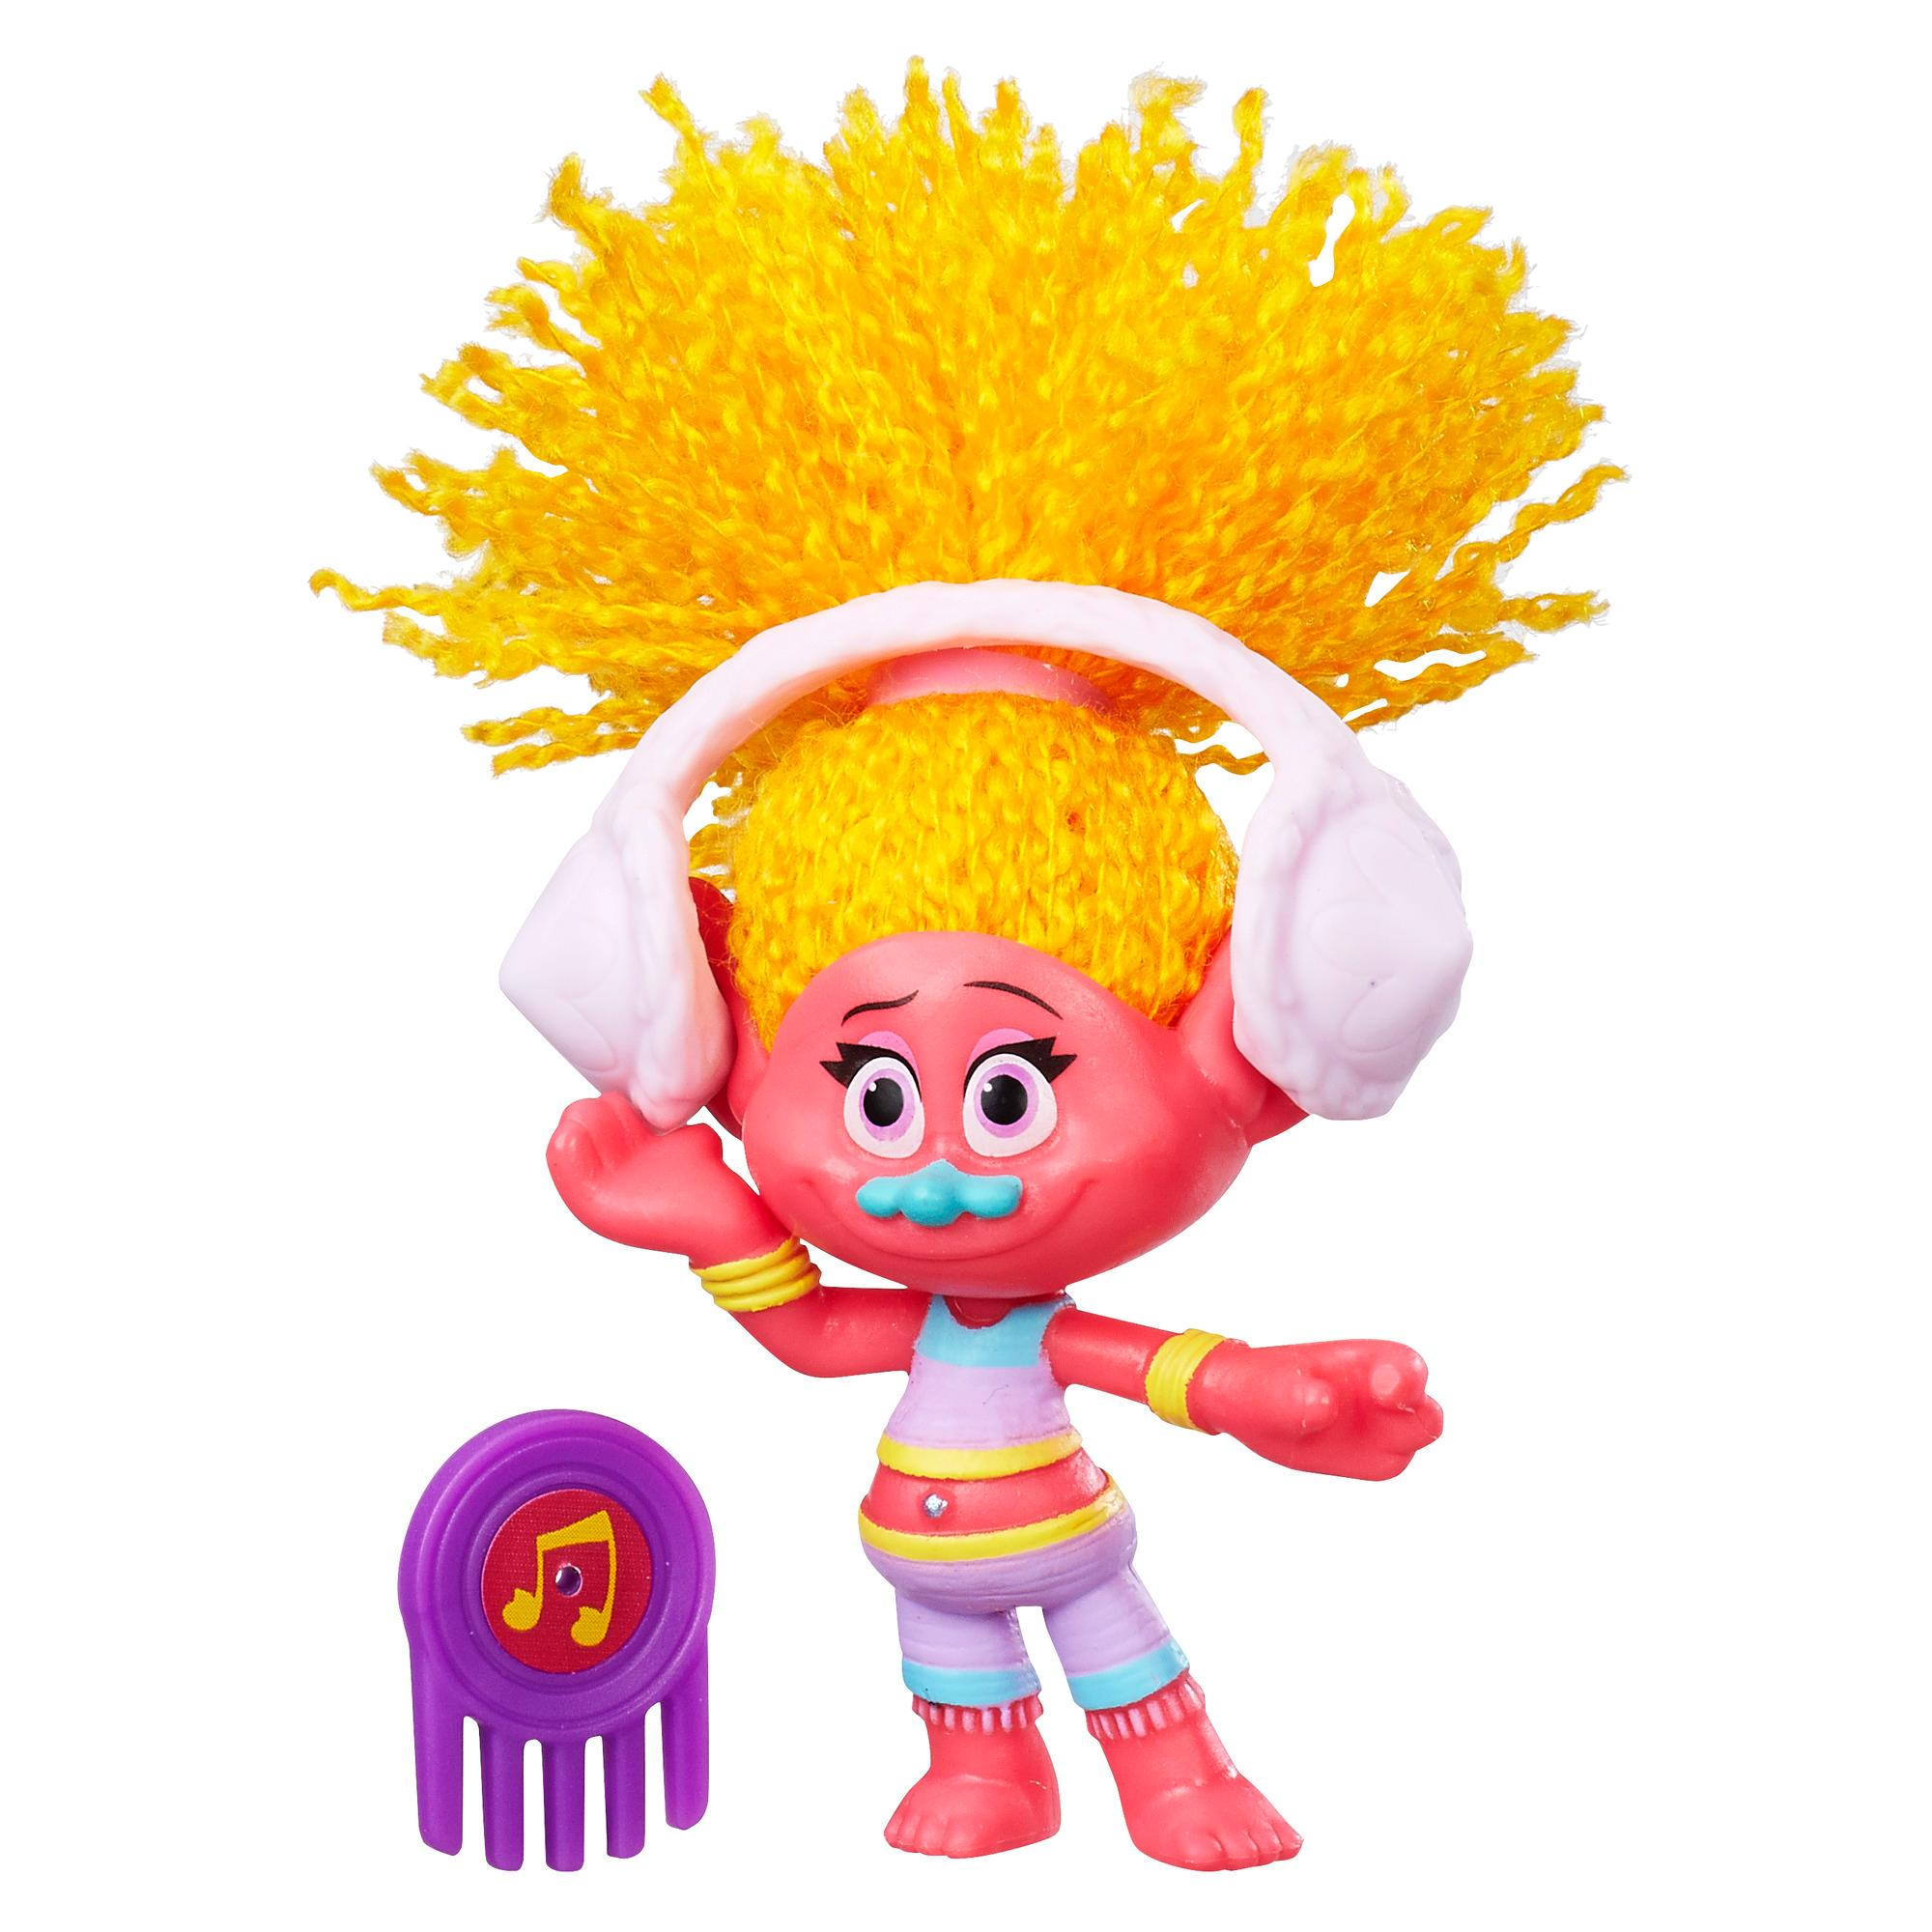 figurina trolls - dj suki, 10 cm